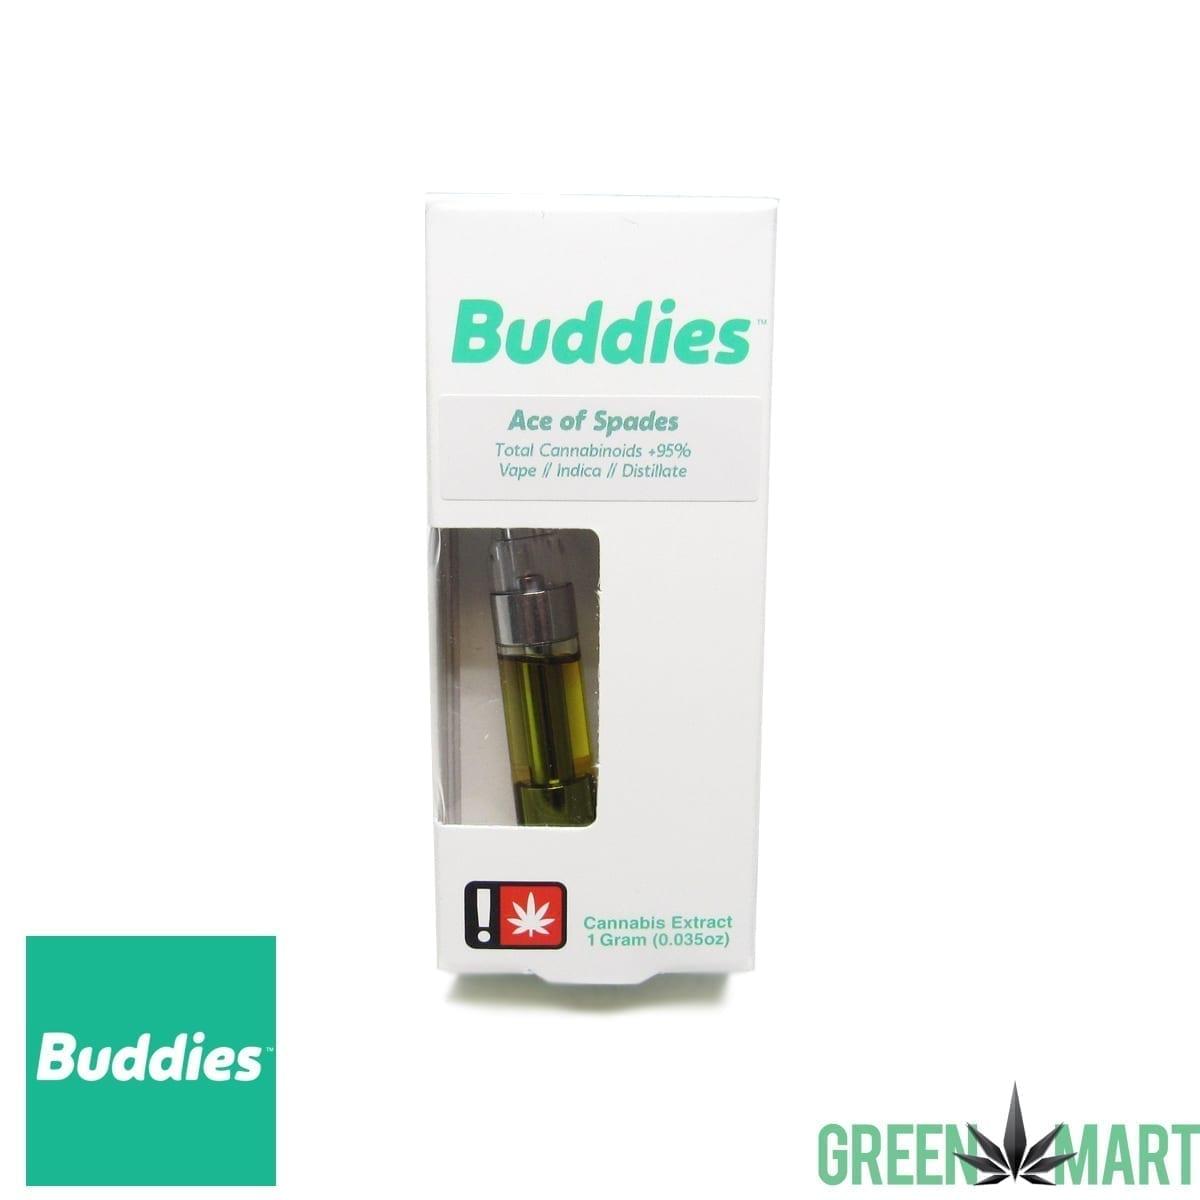 Buddies Brand Cartridge - Ace of Spades